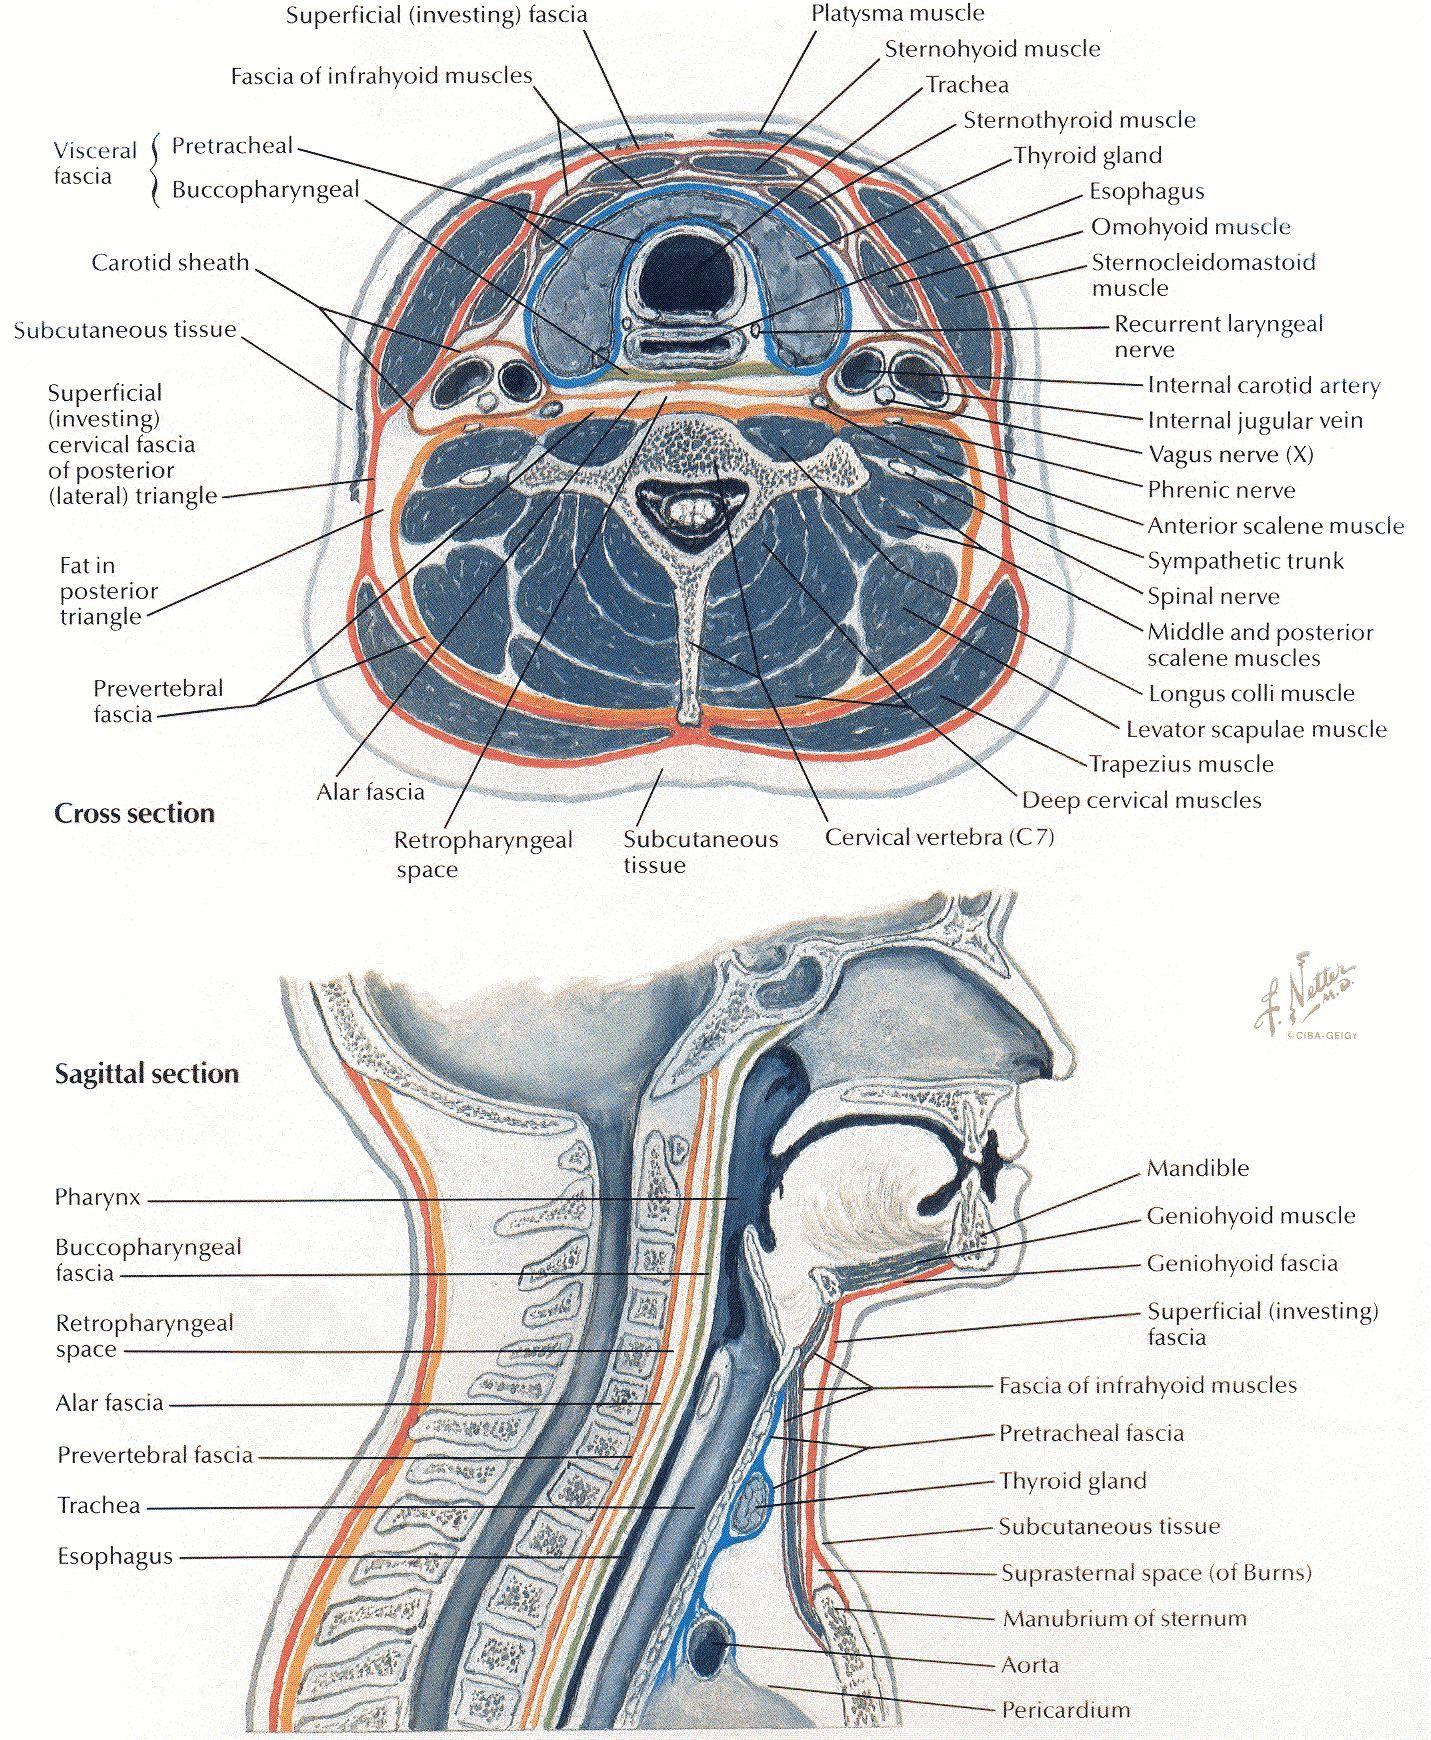 Netter 030 cross/sagittal view | Anatomy | Pinterest | Health education